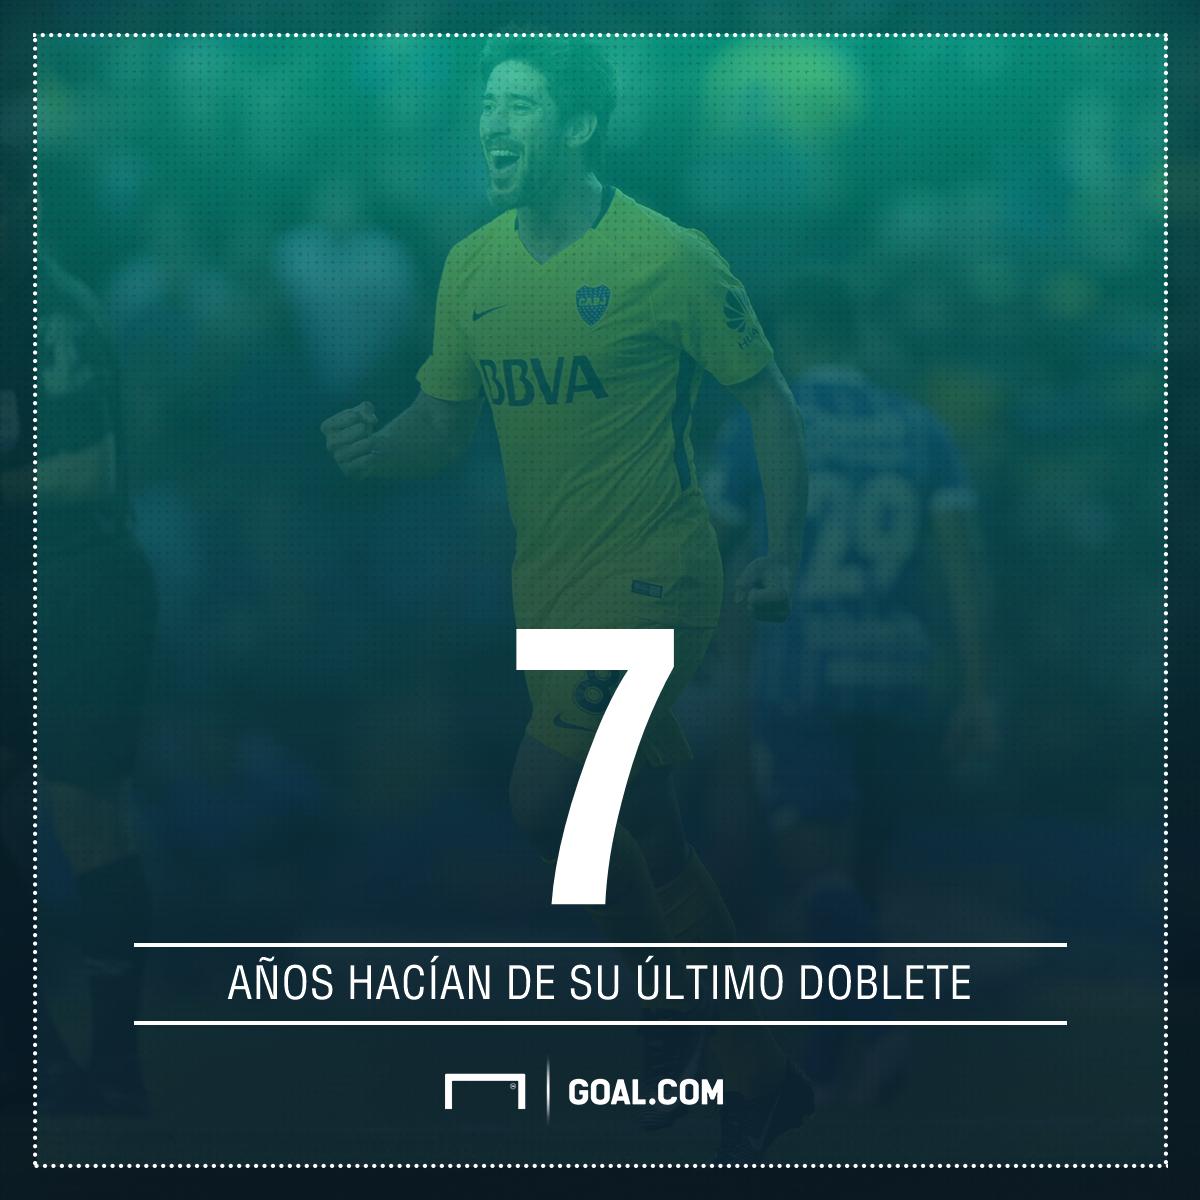 GFX Stat Pablo Perez Doblete